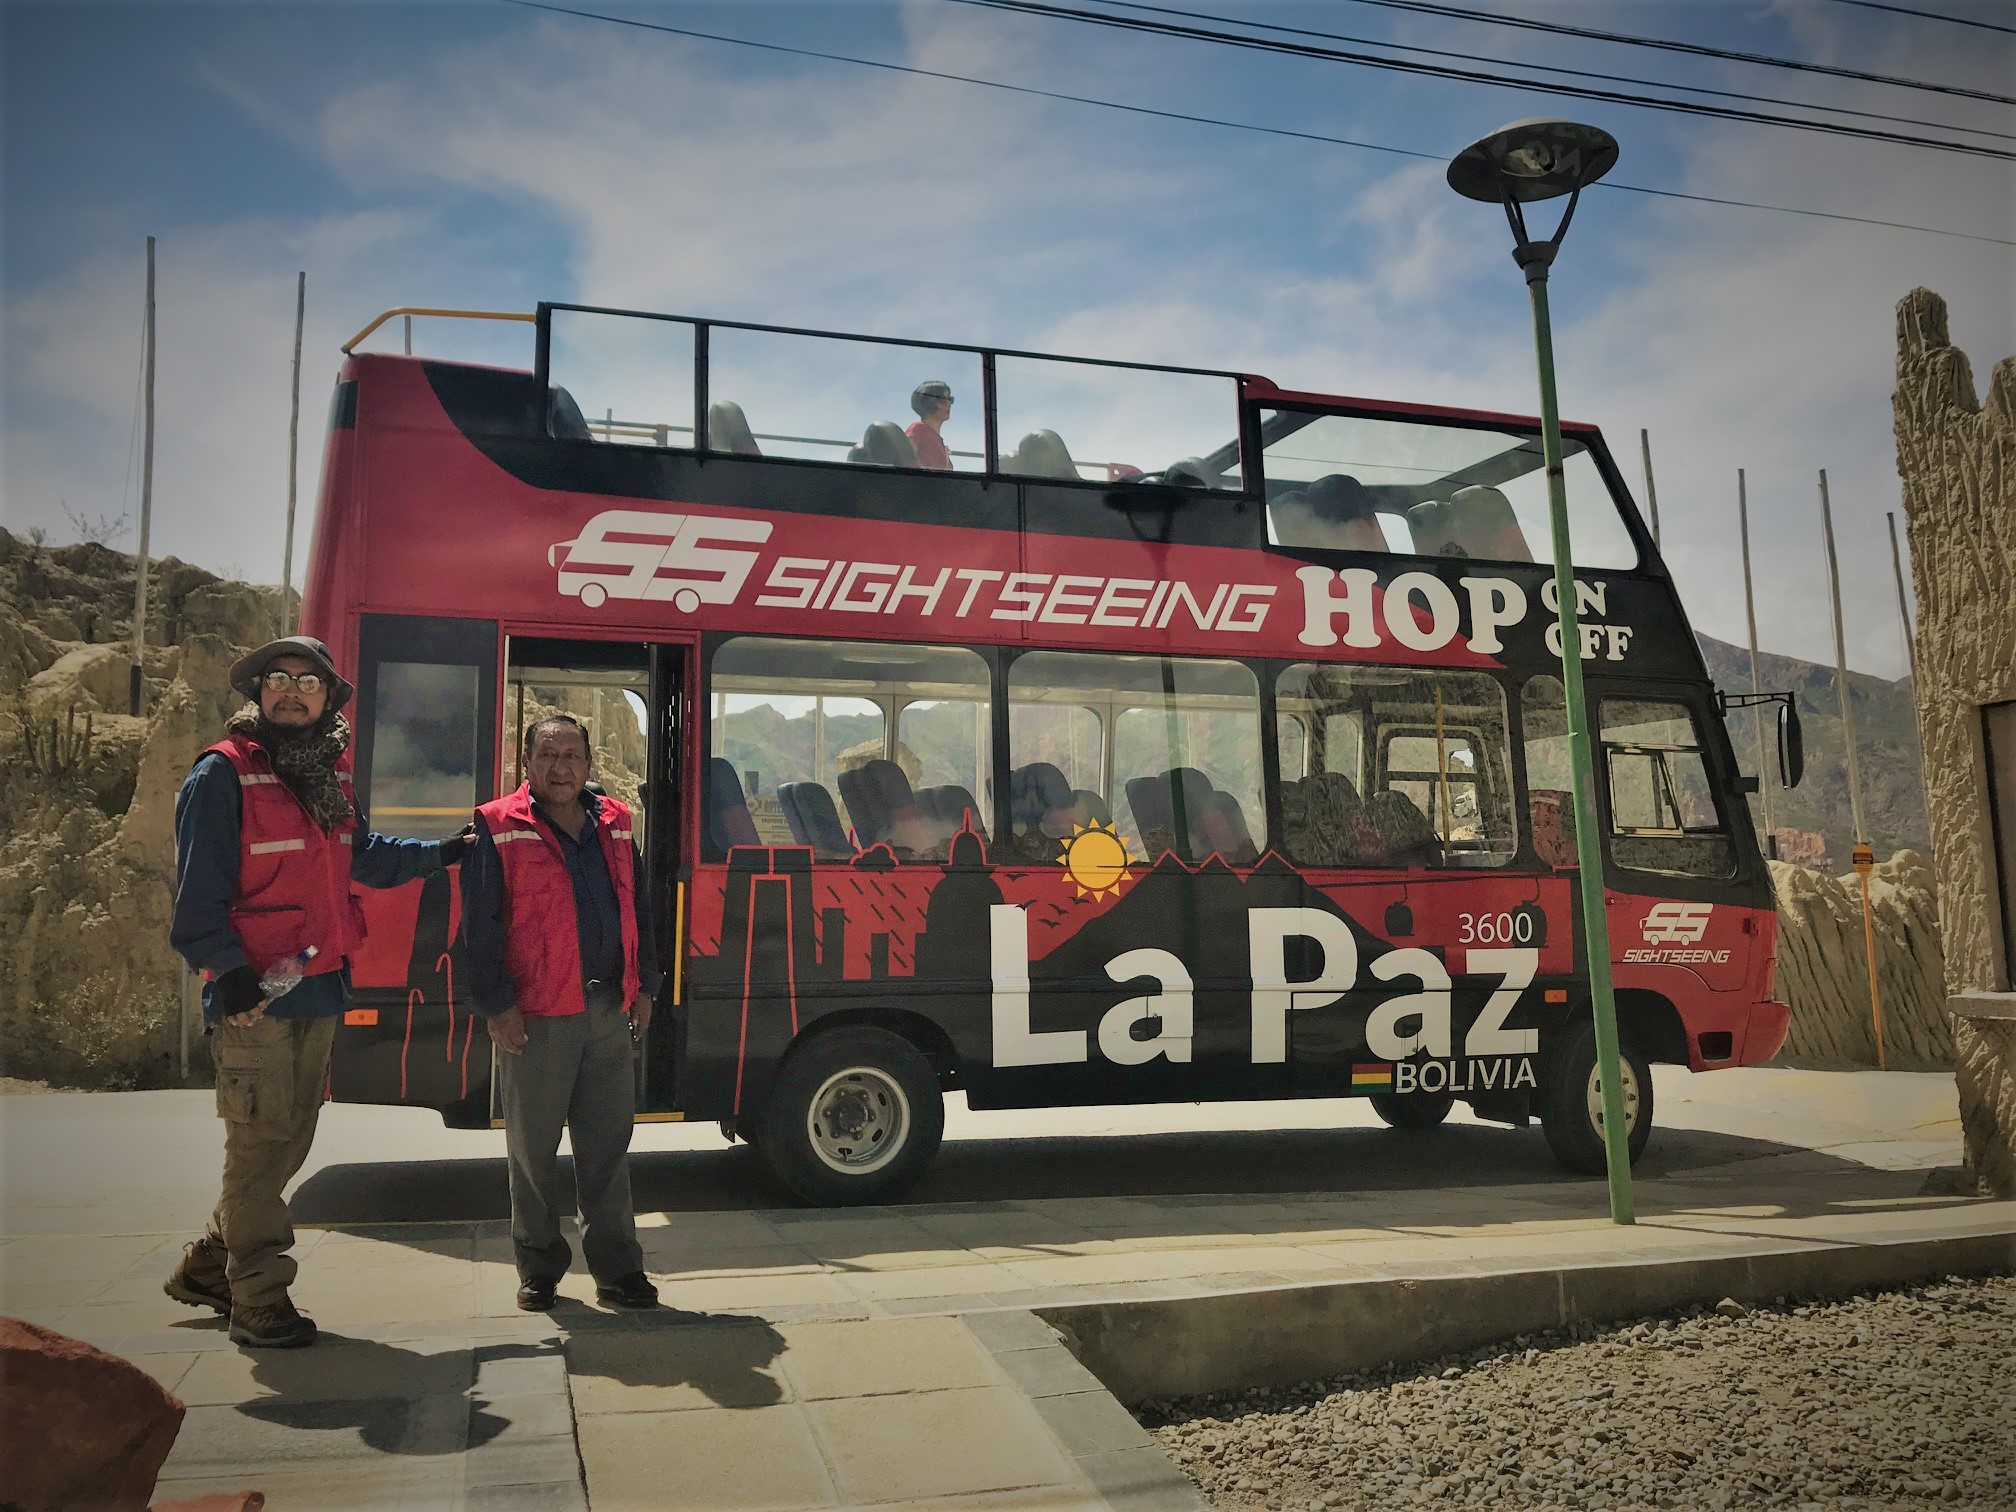 Sightseeing City Tour La Paz